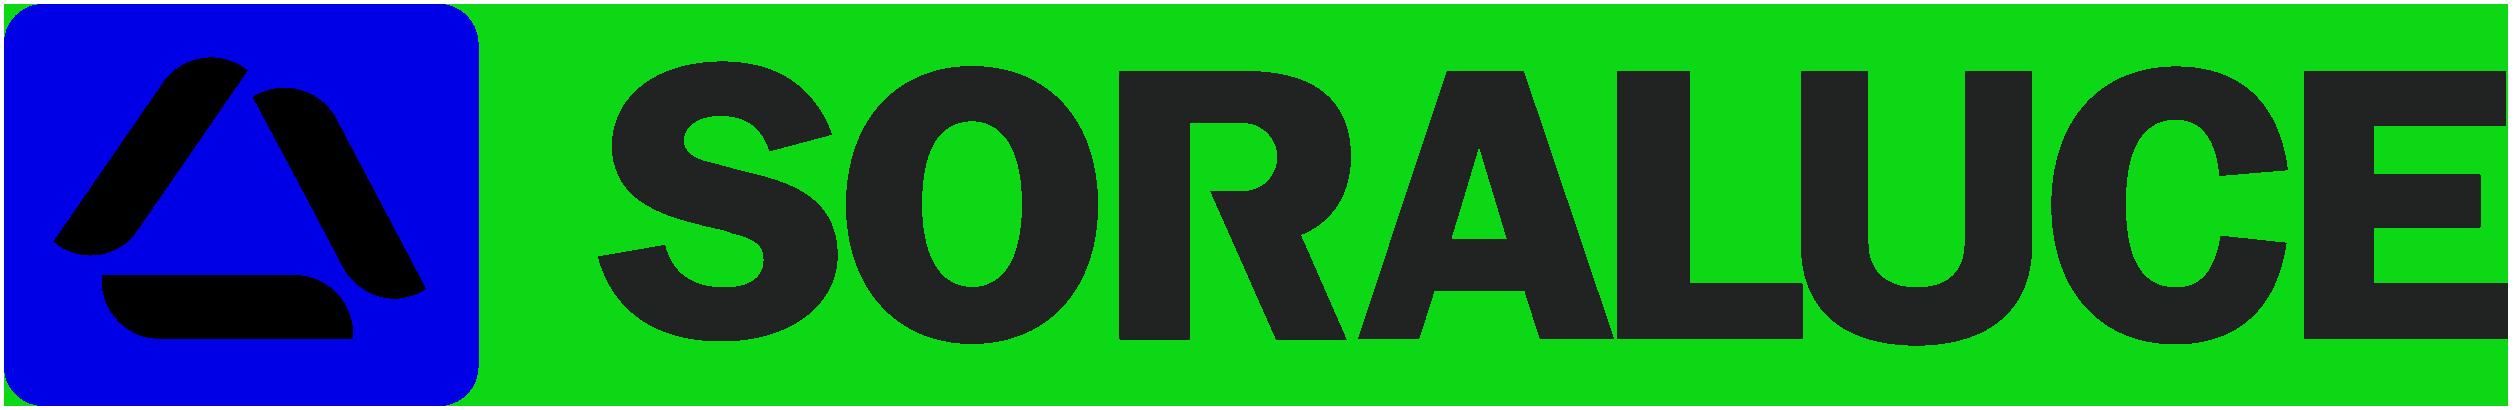 Soraluce Logo